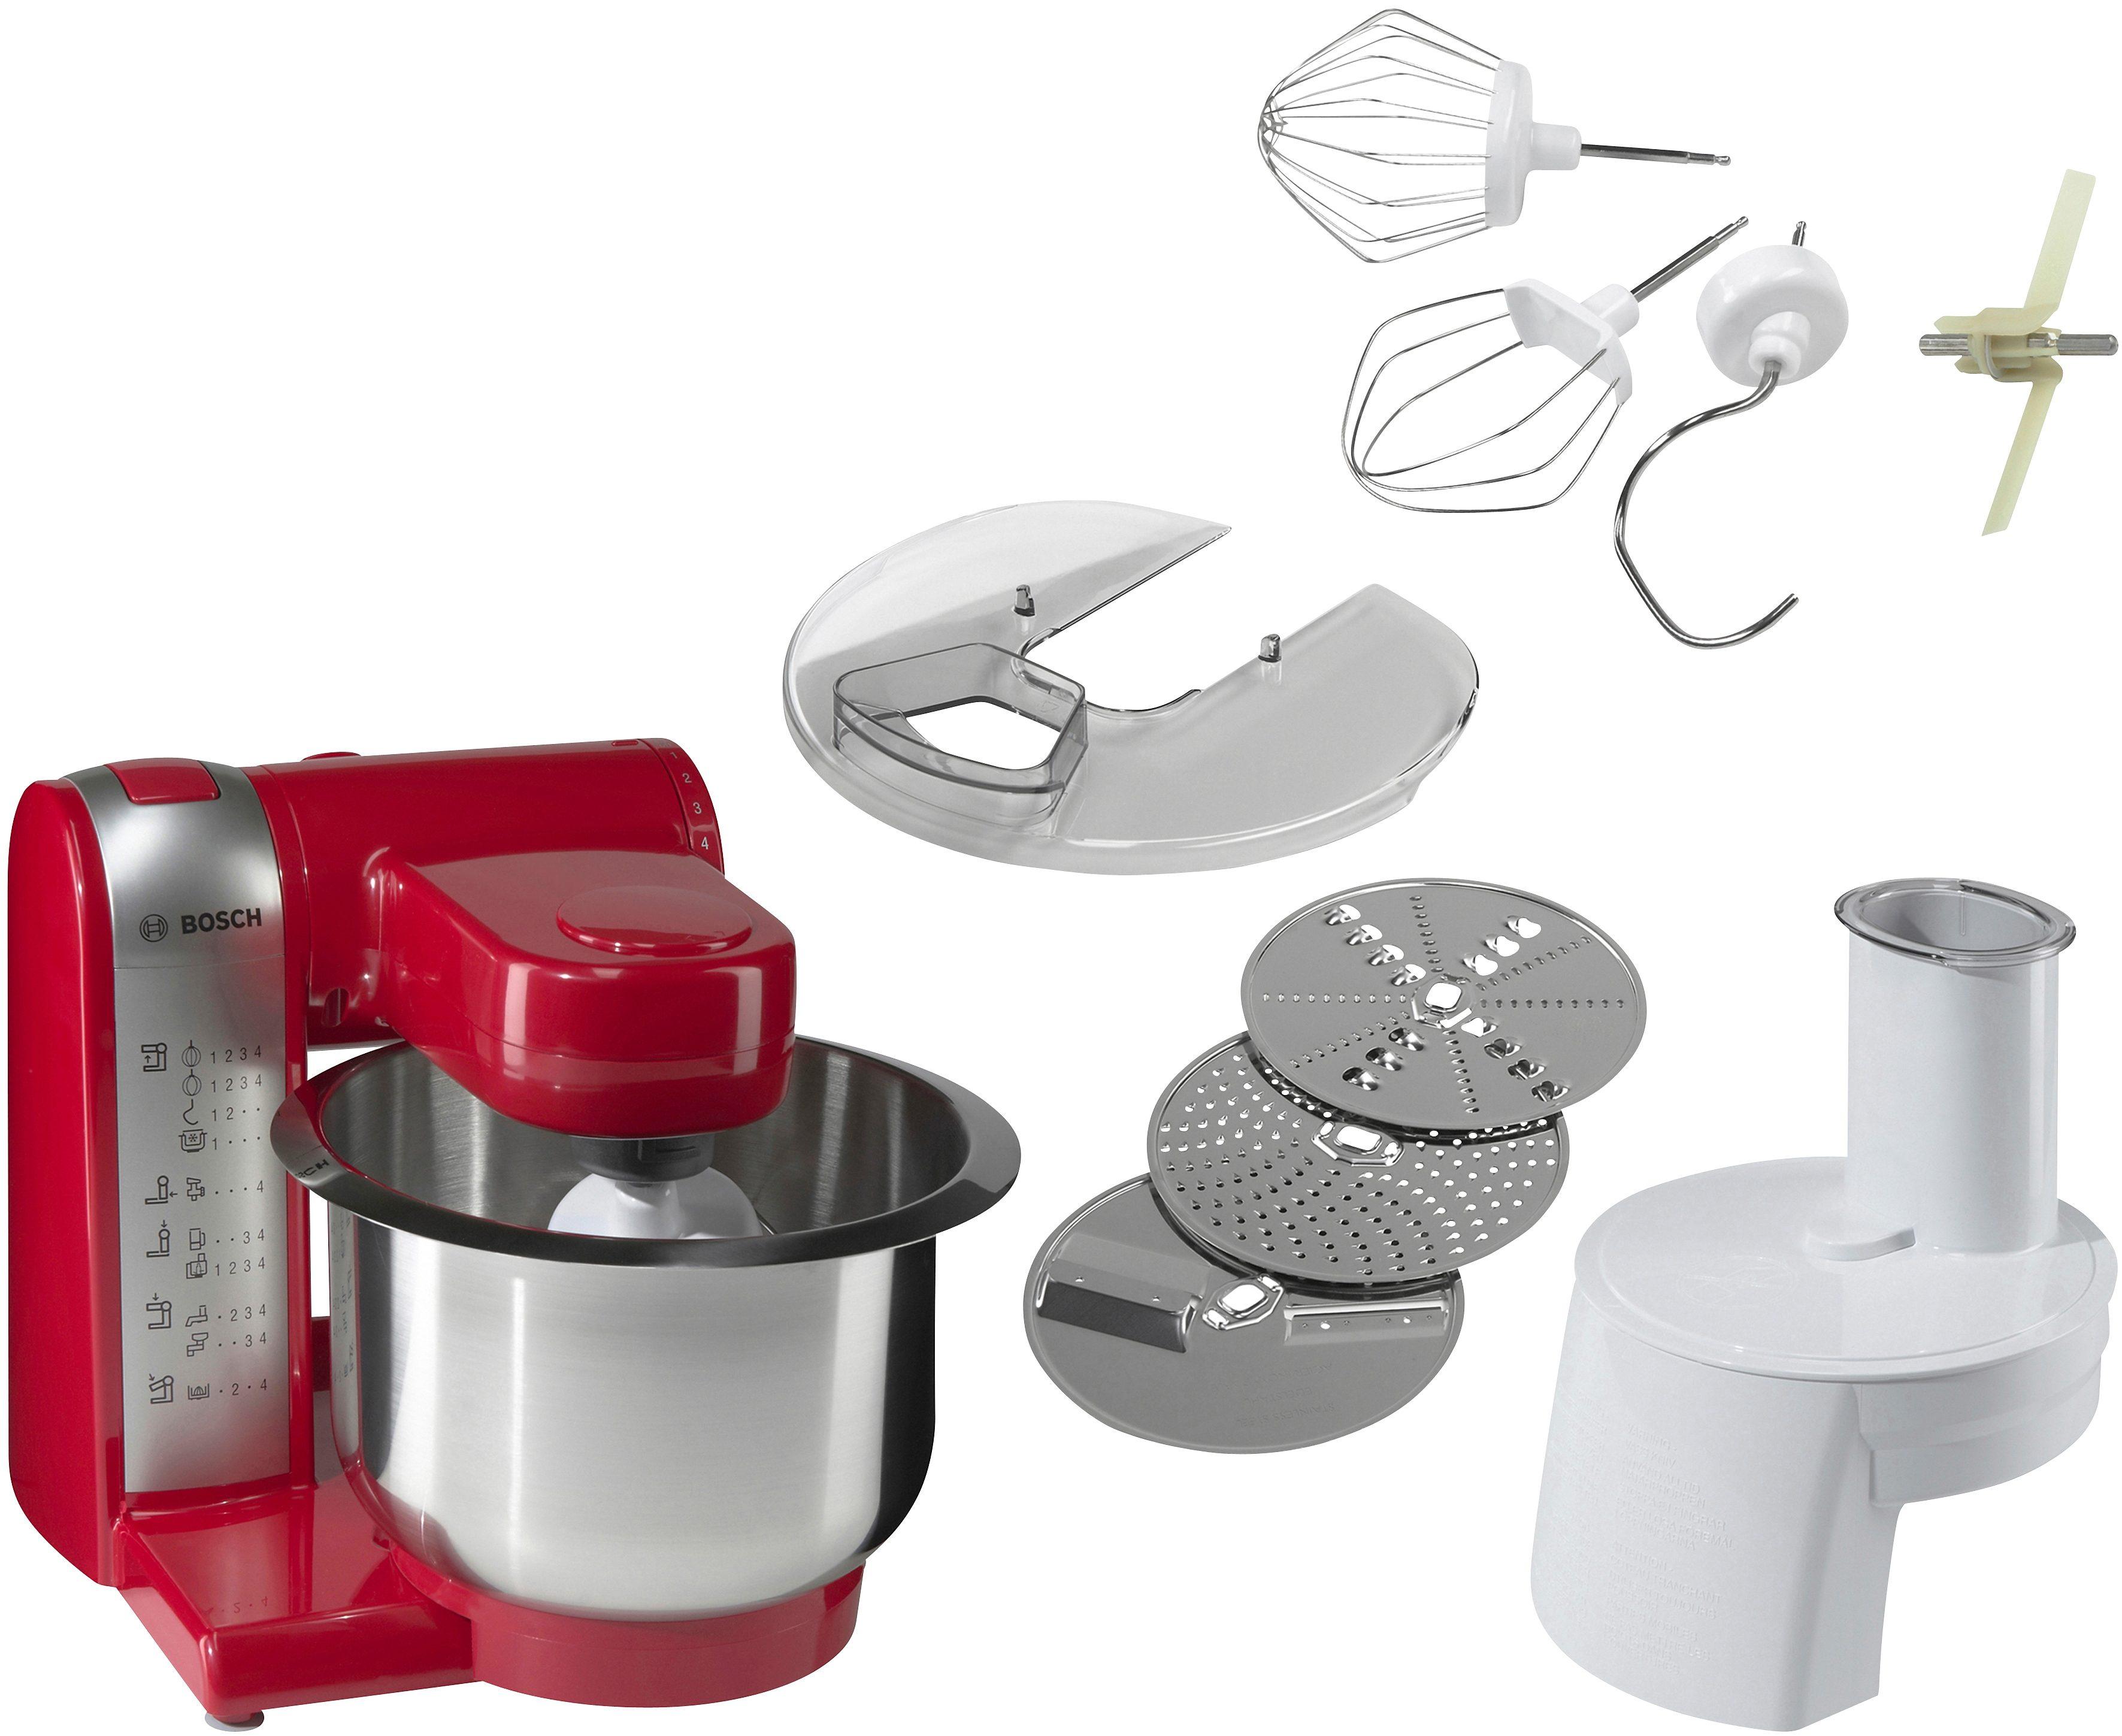 Otto Kühlschrank Bosch : Bosch mum küchenmaschine mum watt edelstahl